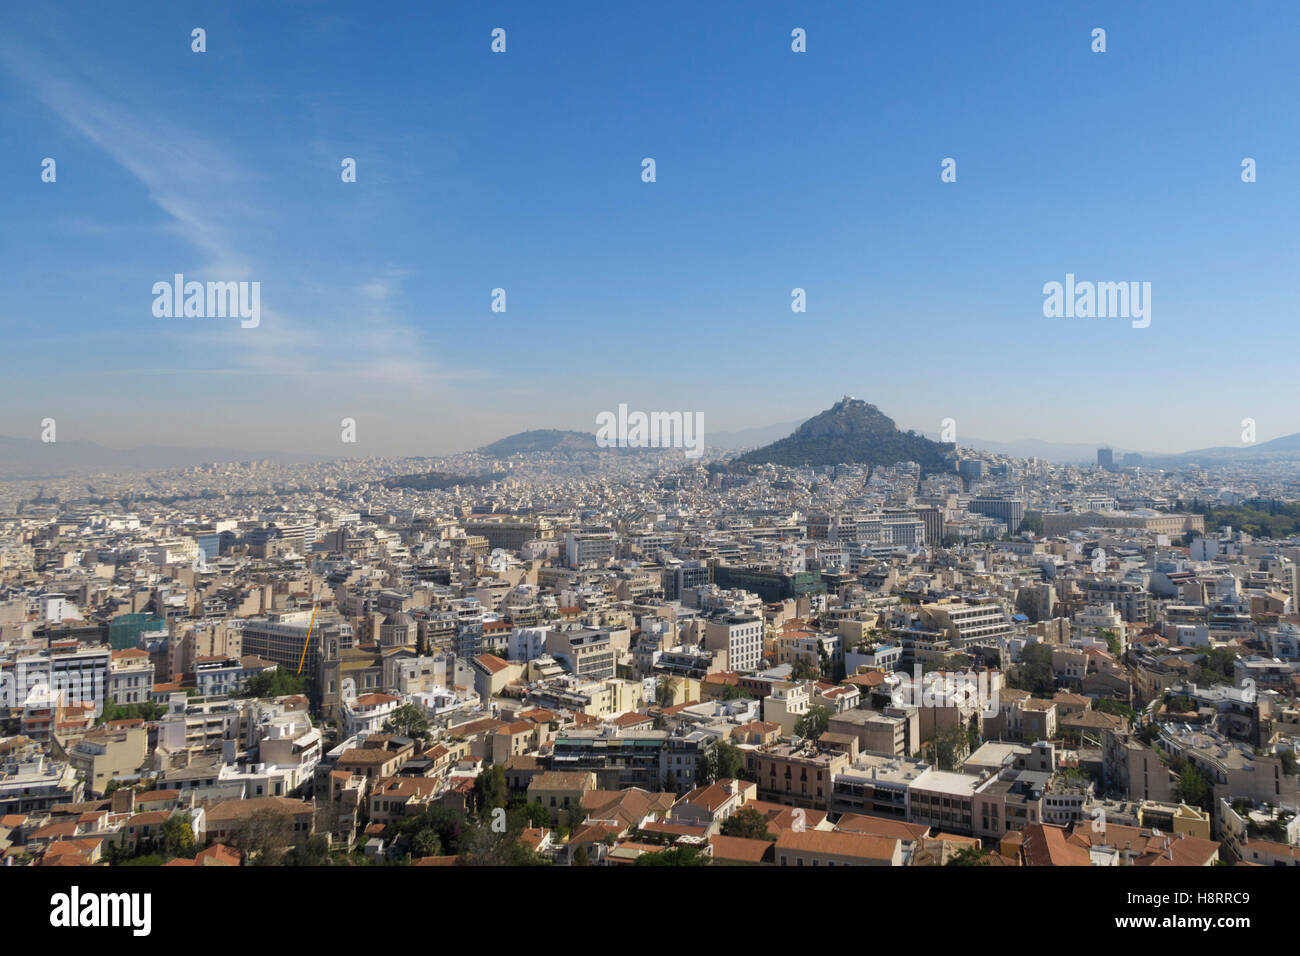 Athens skyline, Greece - Stock Image